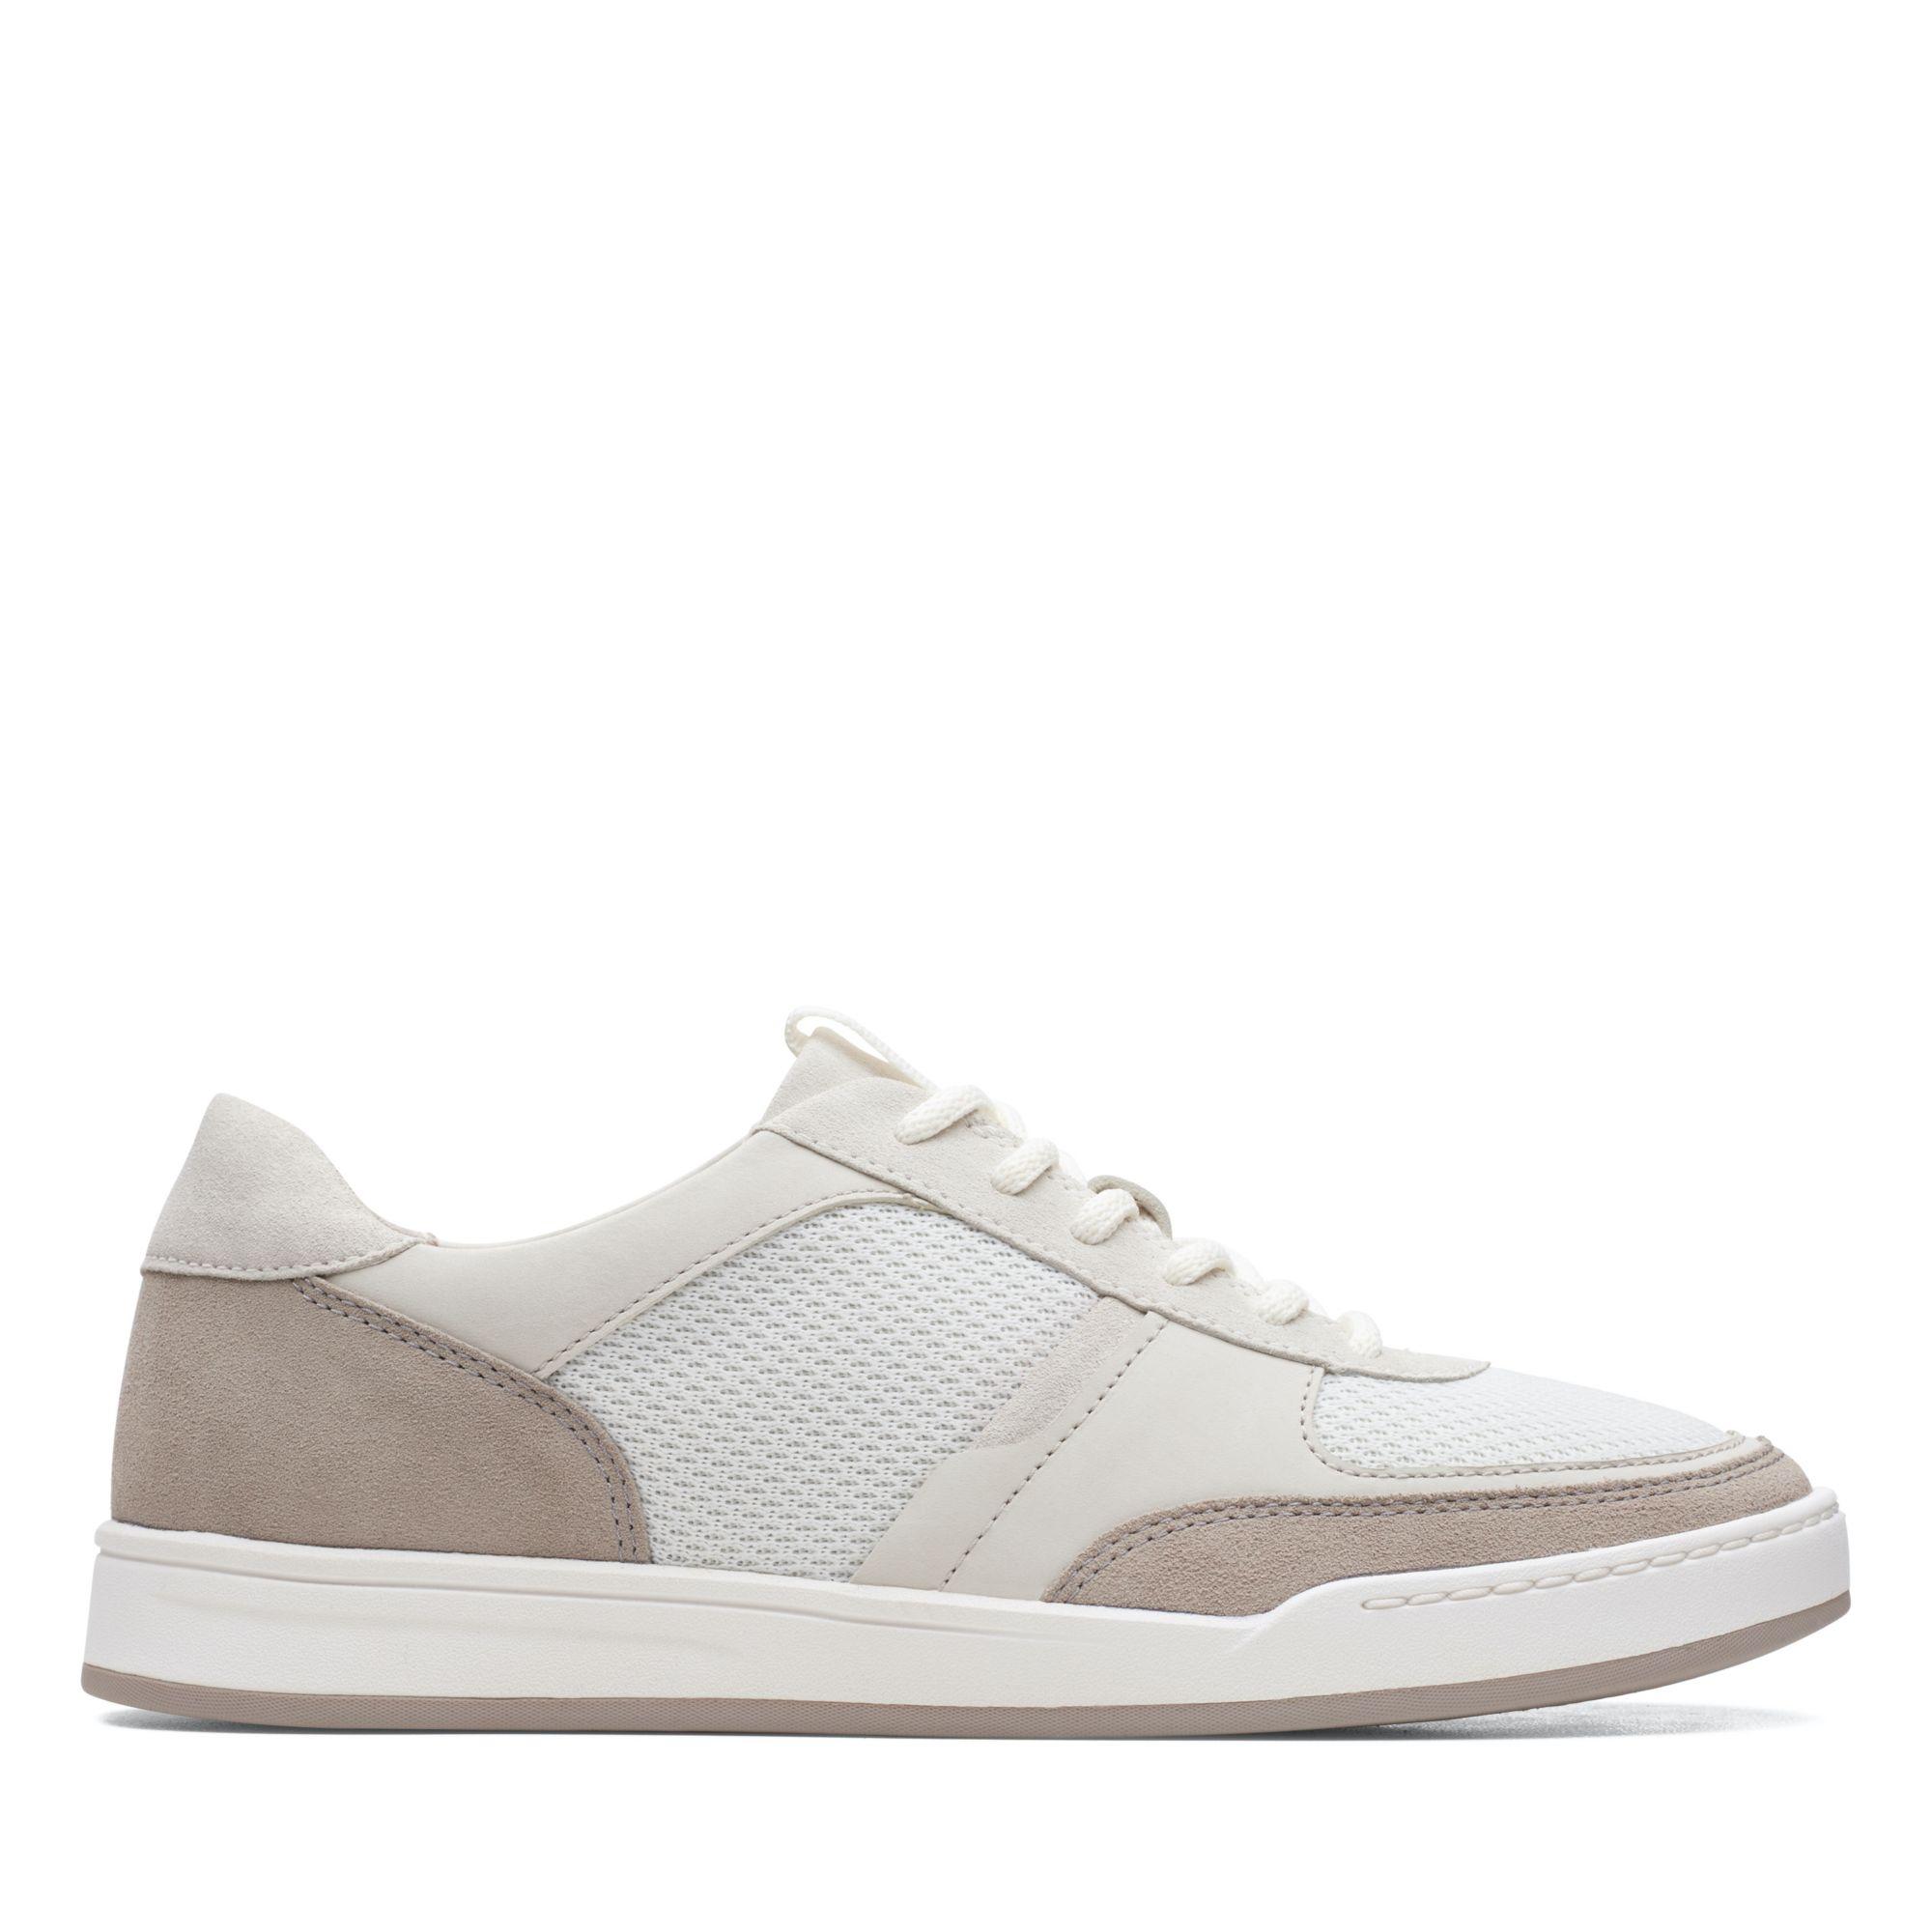 Clarks Bizby Lace Stone Combi Shoes